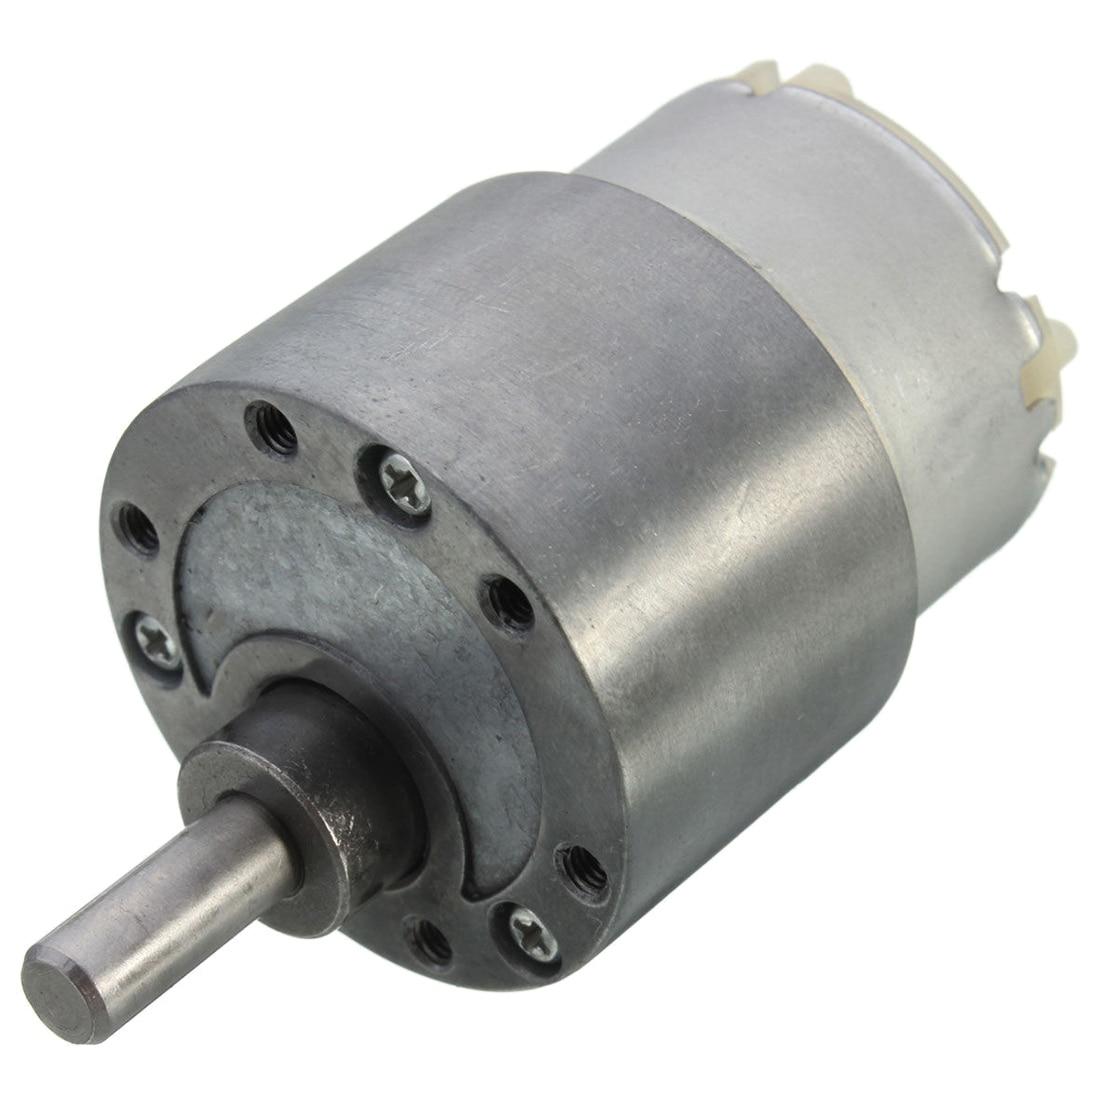 Electric Mini 12VDC 70 RPM High Torque Gear Motor Speed Control MotorElectric Mini 12VDC 70 RPM High Torque Gear Motor Speed Control Motor